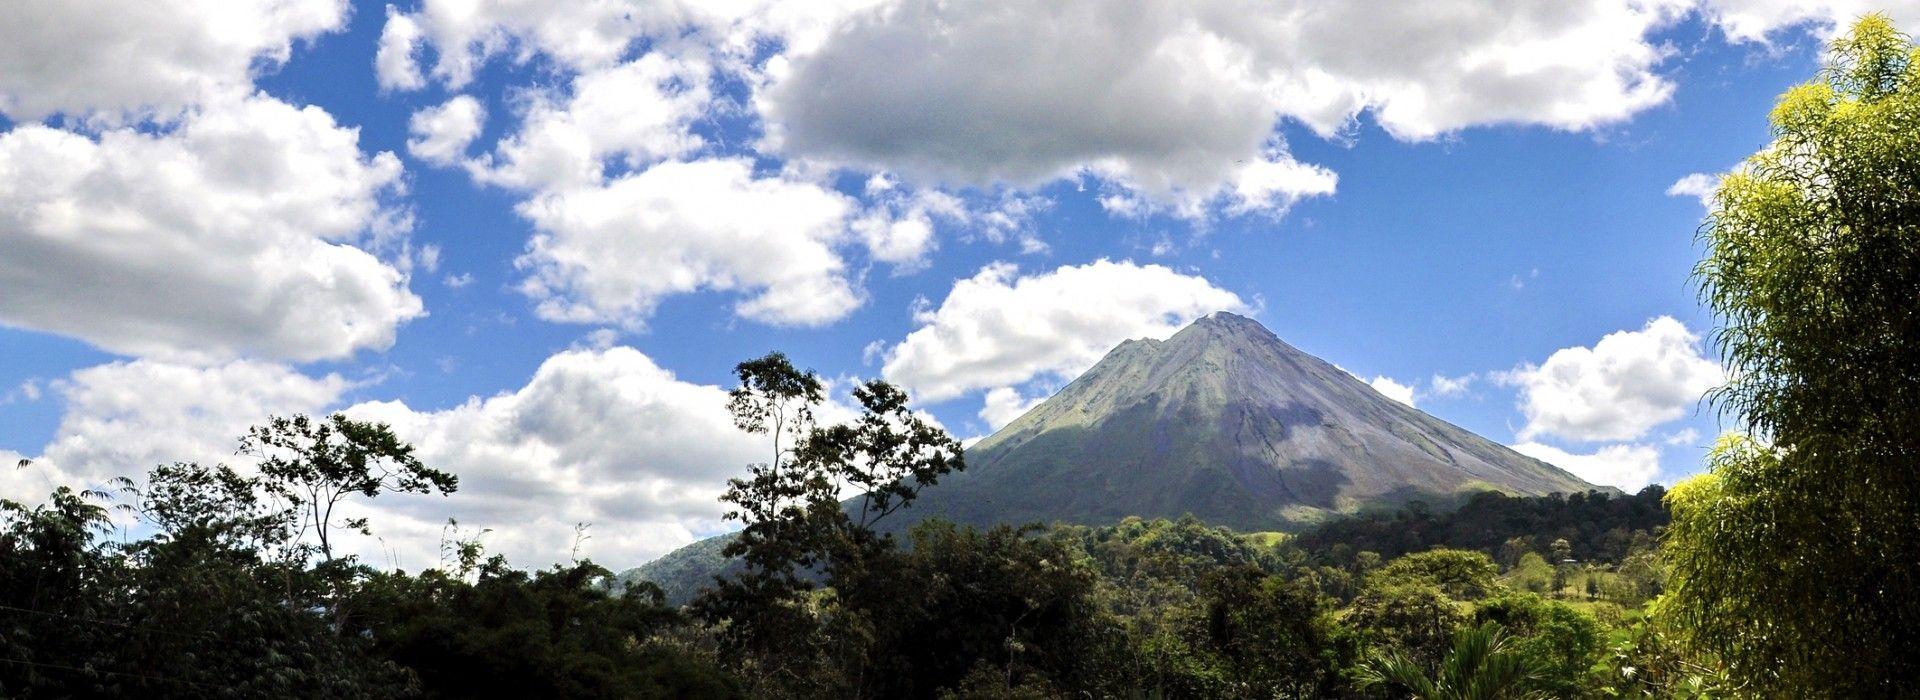 La Fortuna is home to Costa Rica's most popular volcano, Arenal Volcano.